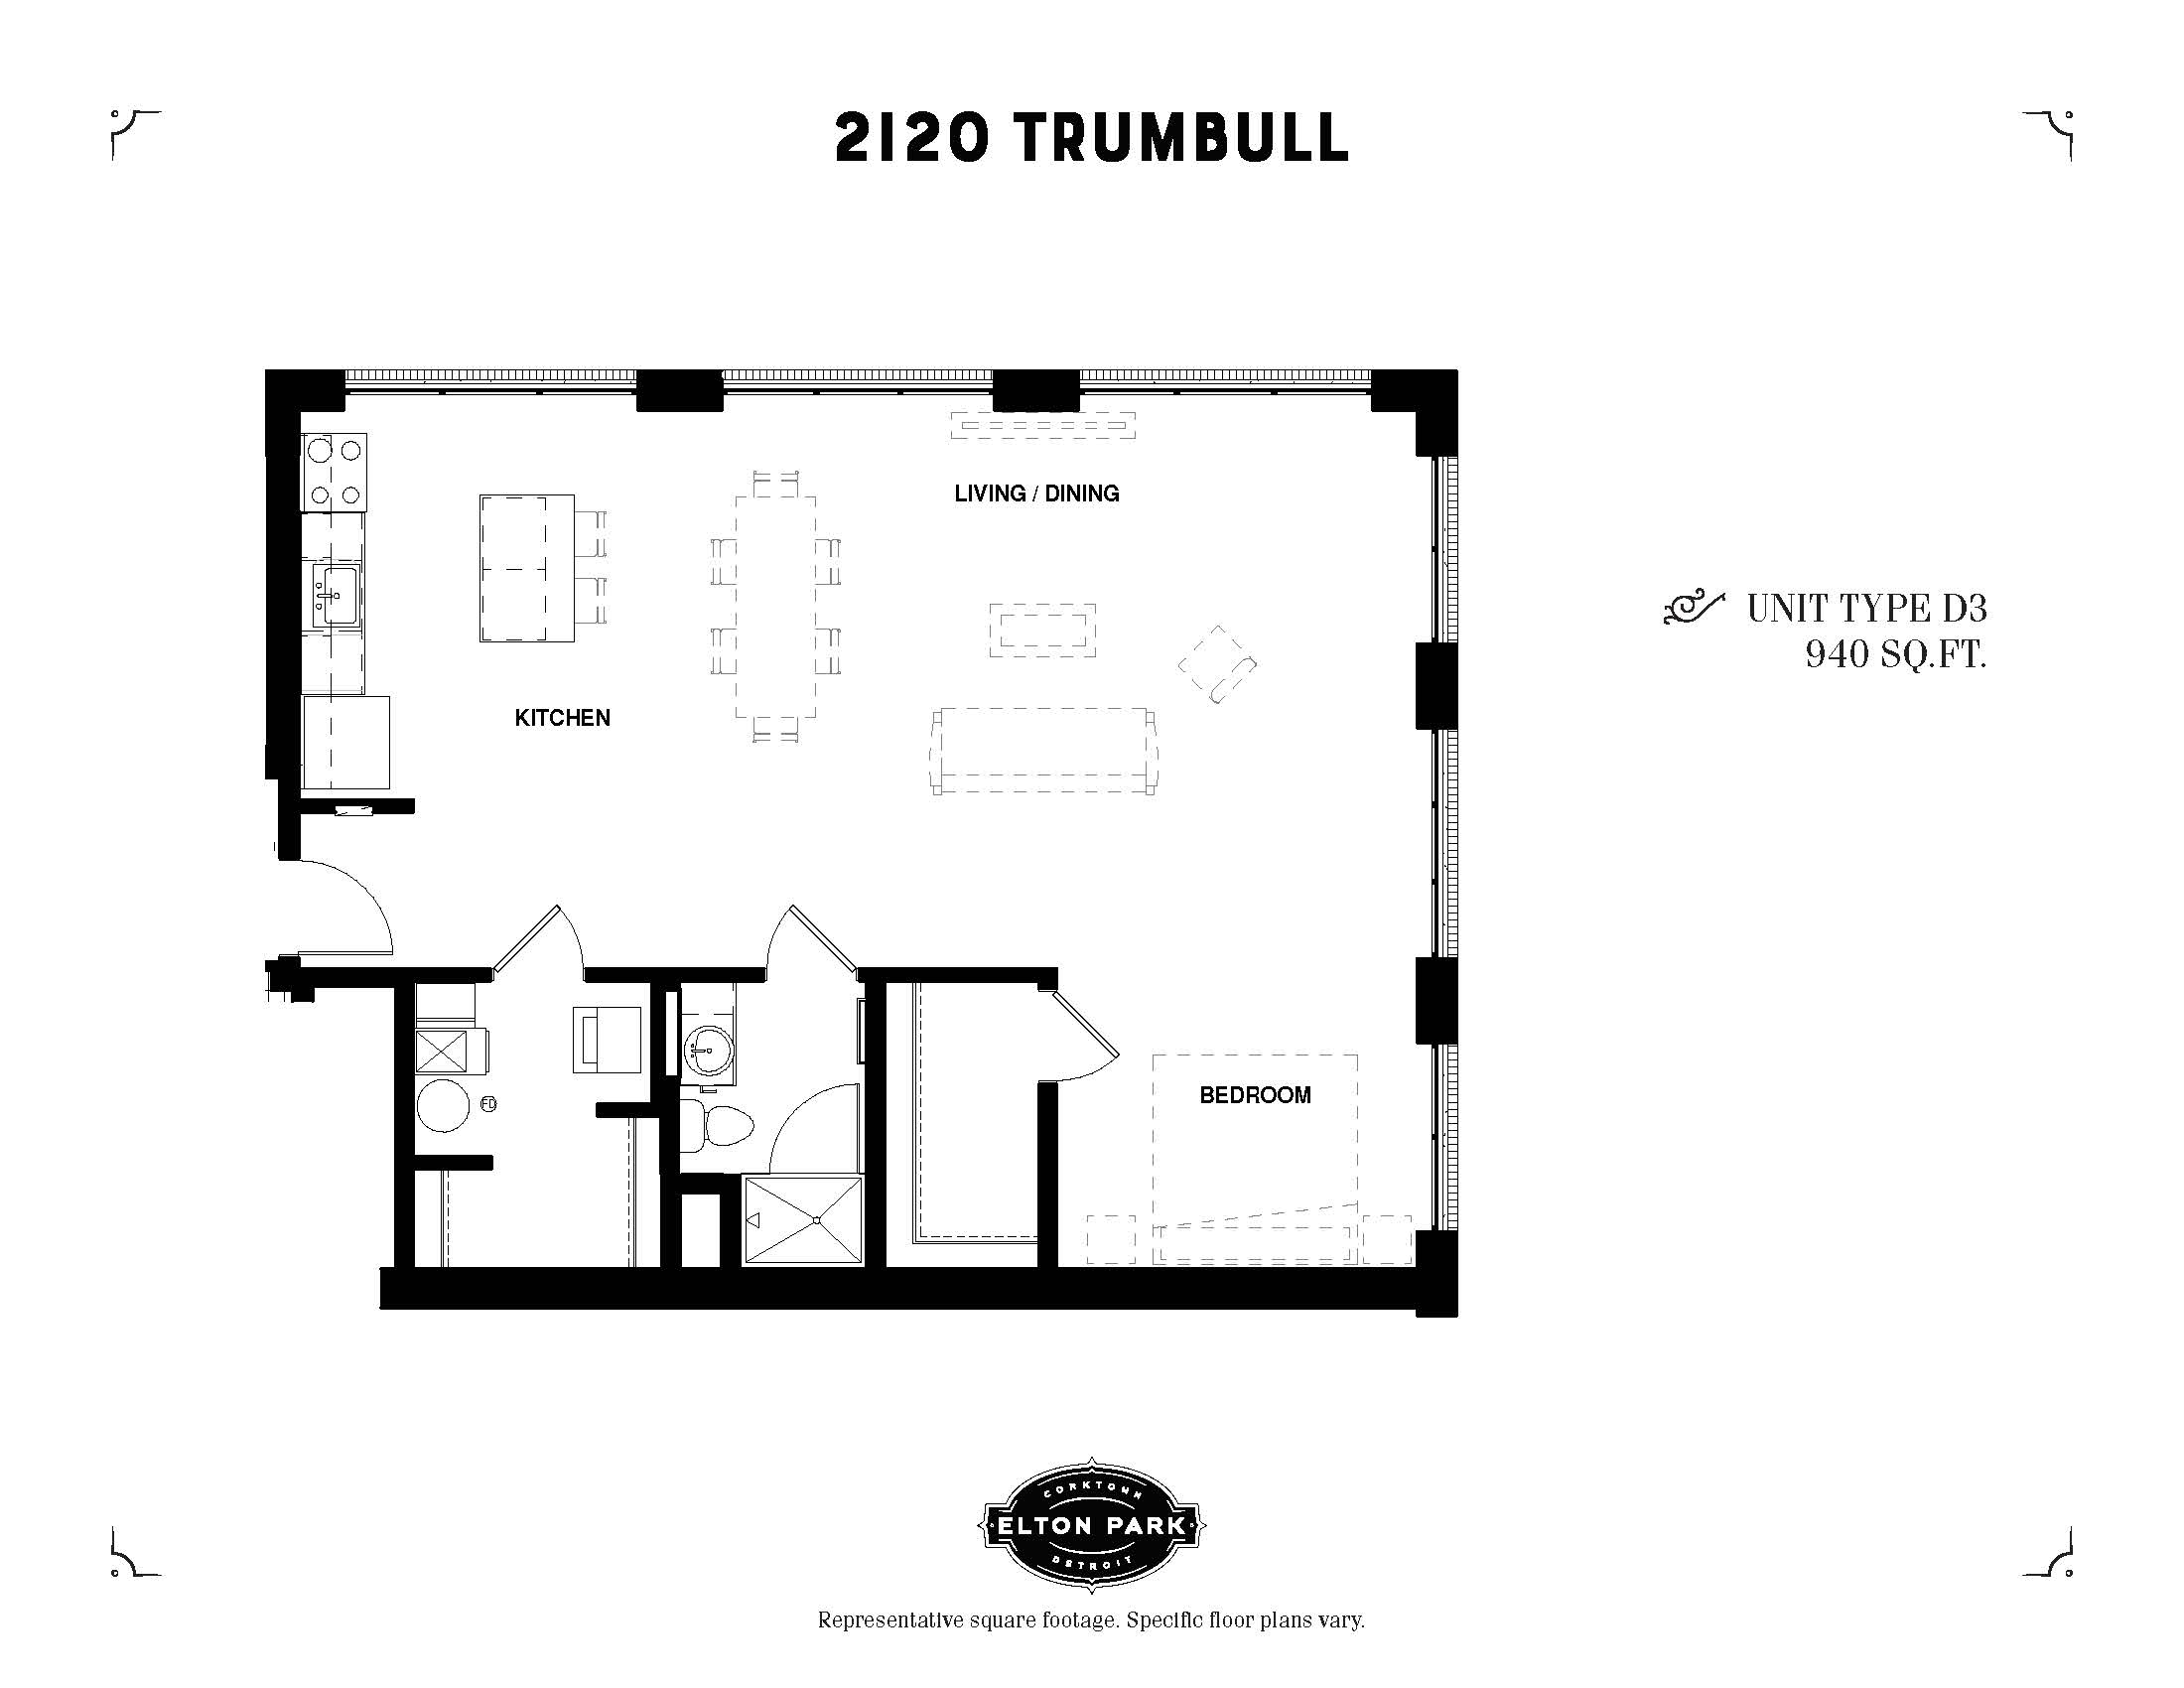 2120 Trumbull Unit Type D3